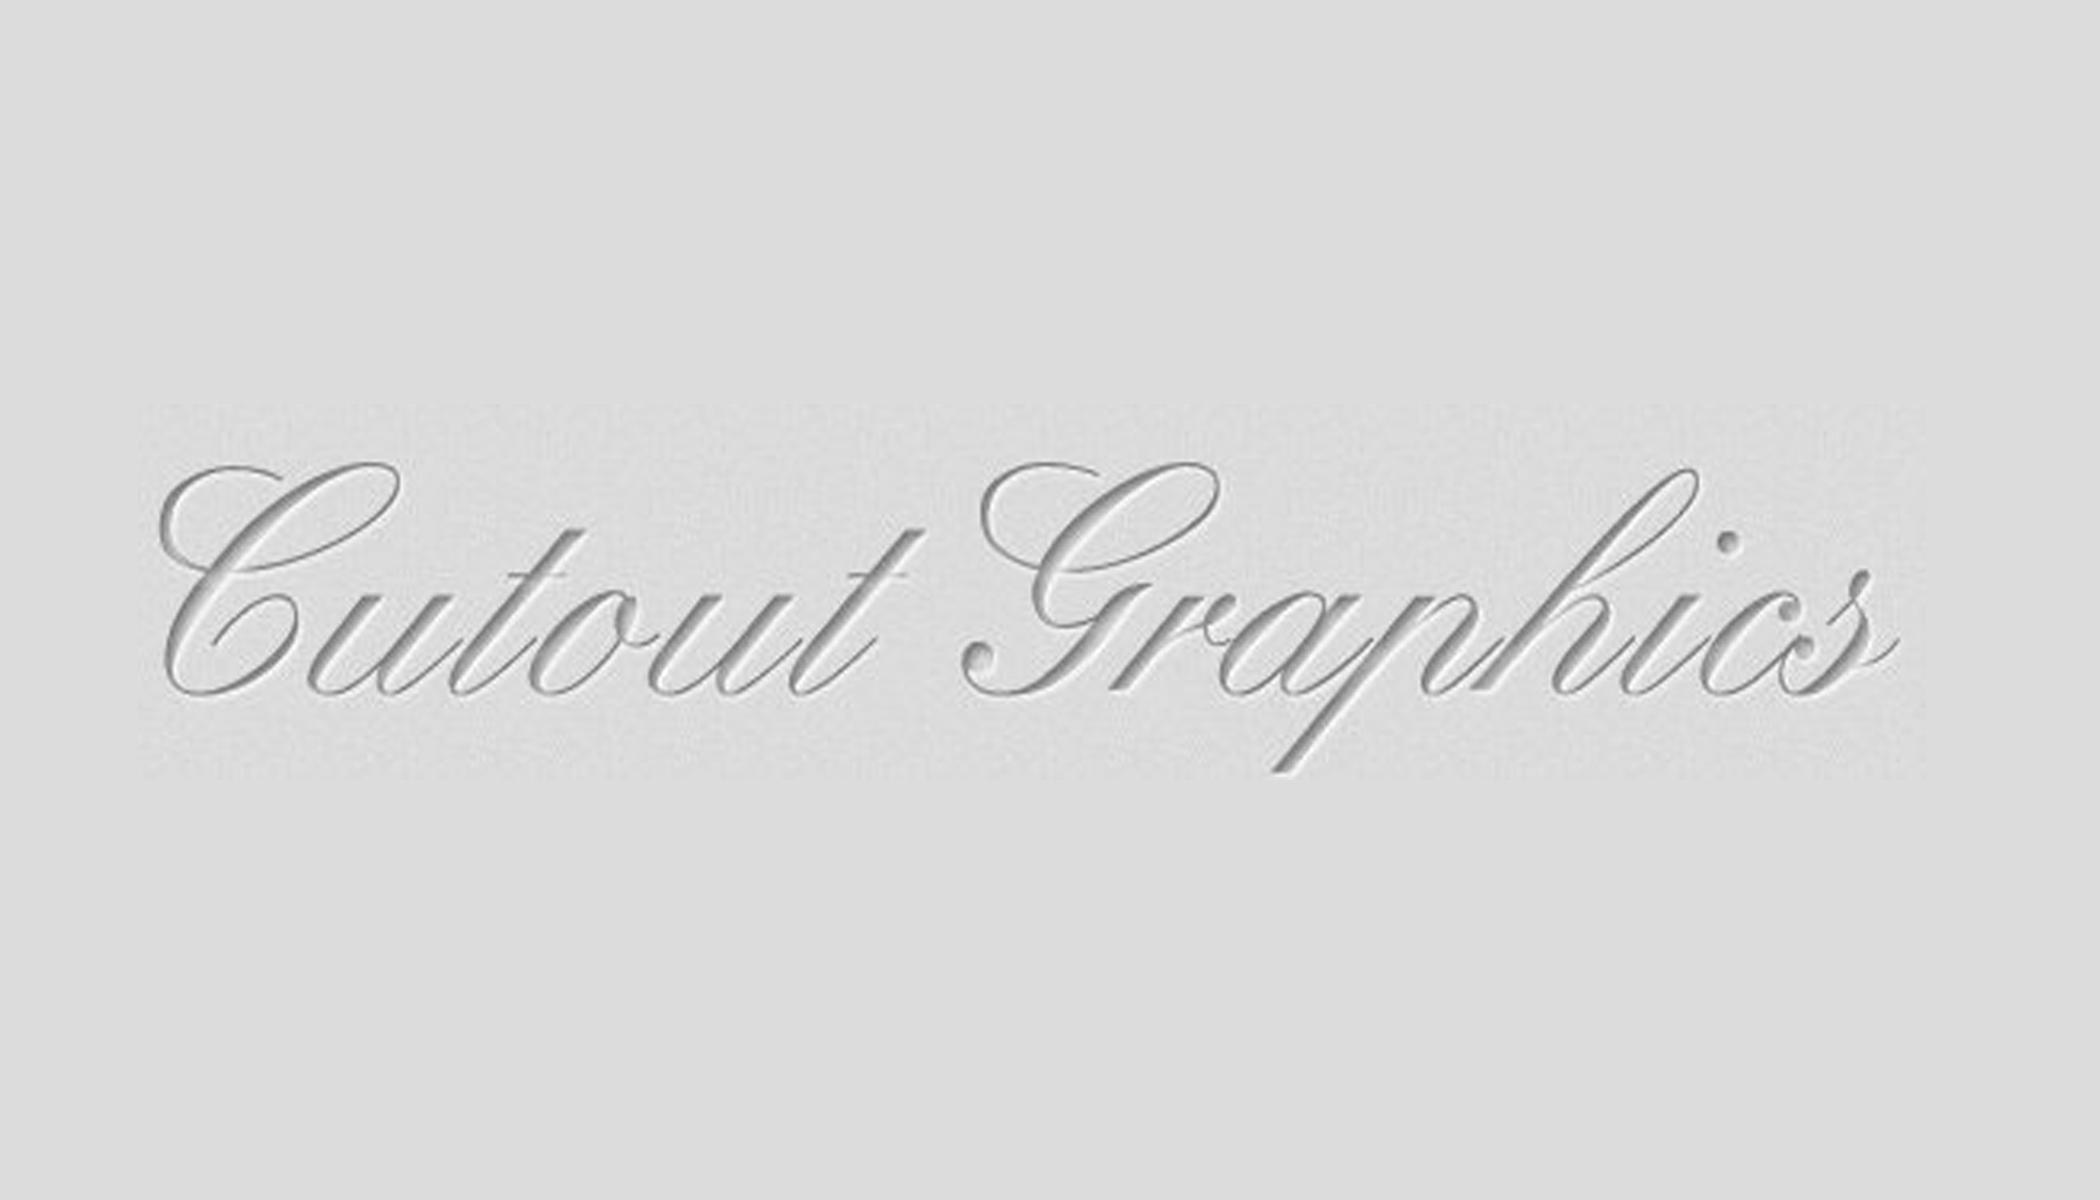 Cutoul Graphics